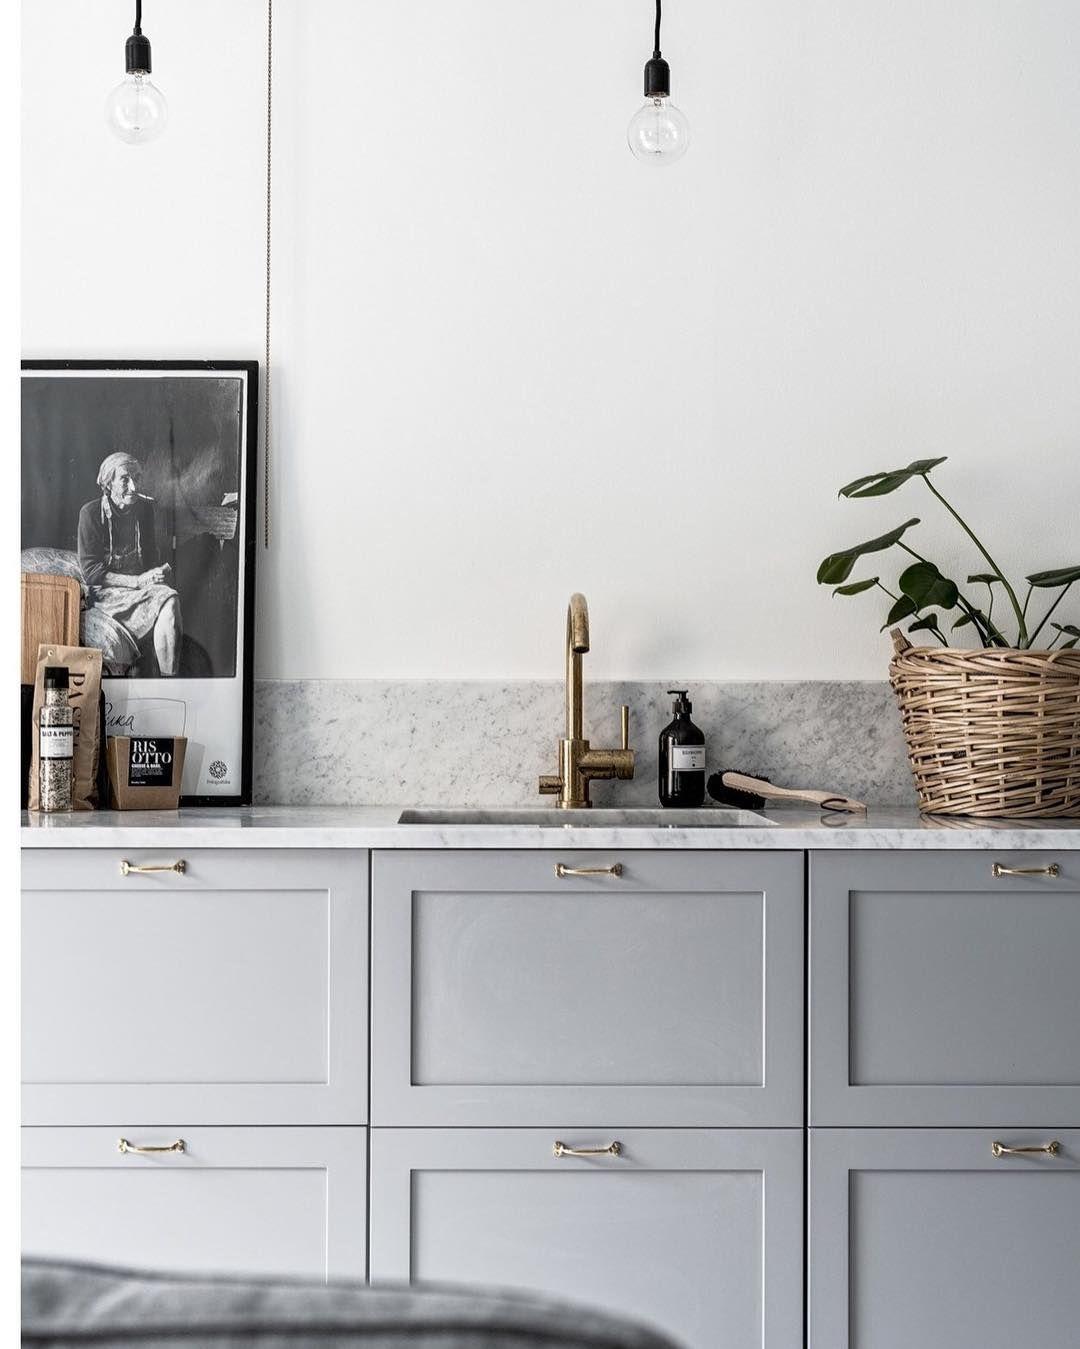 Pin by pene milne on styling inspiration pinterest kitchens